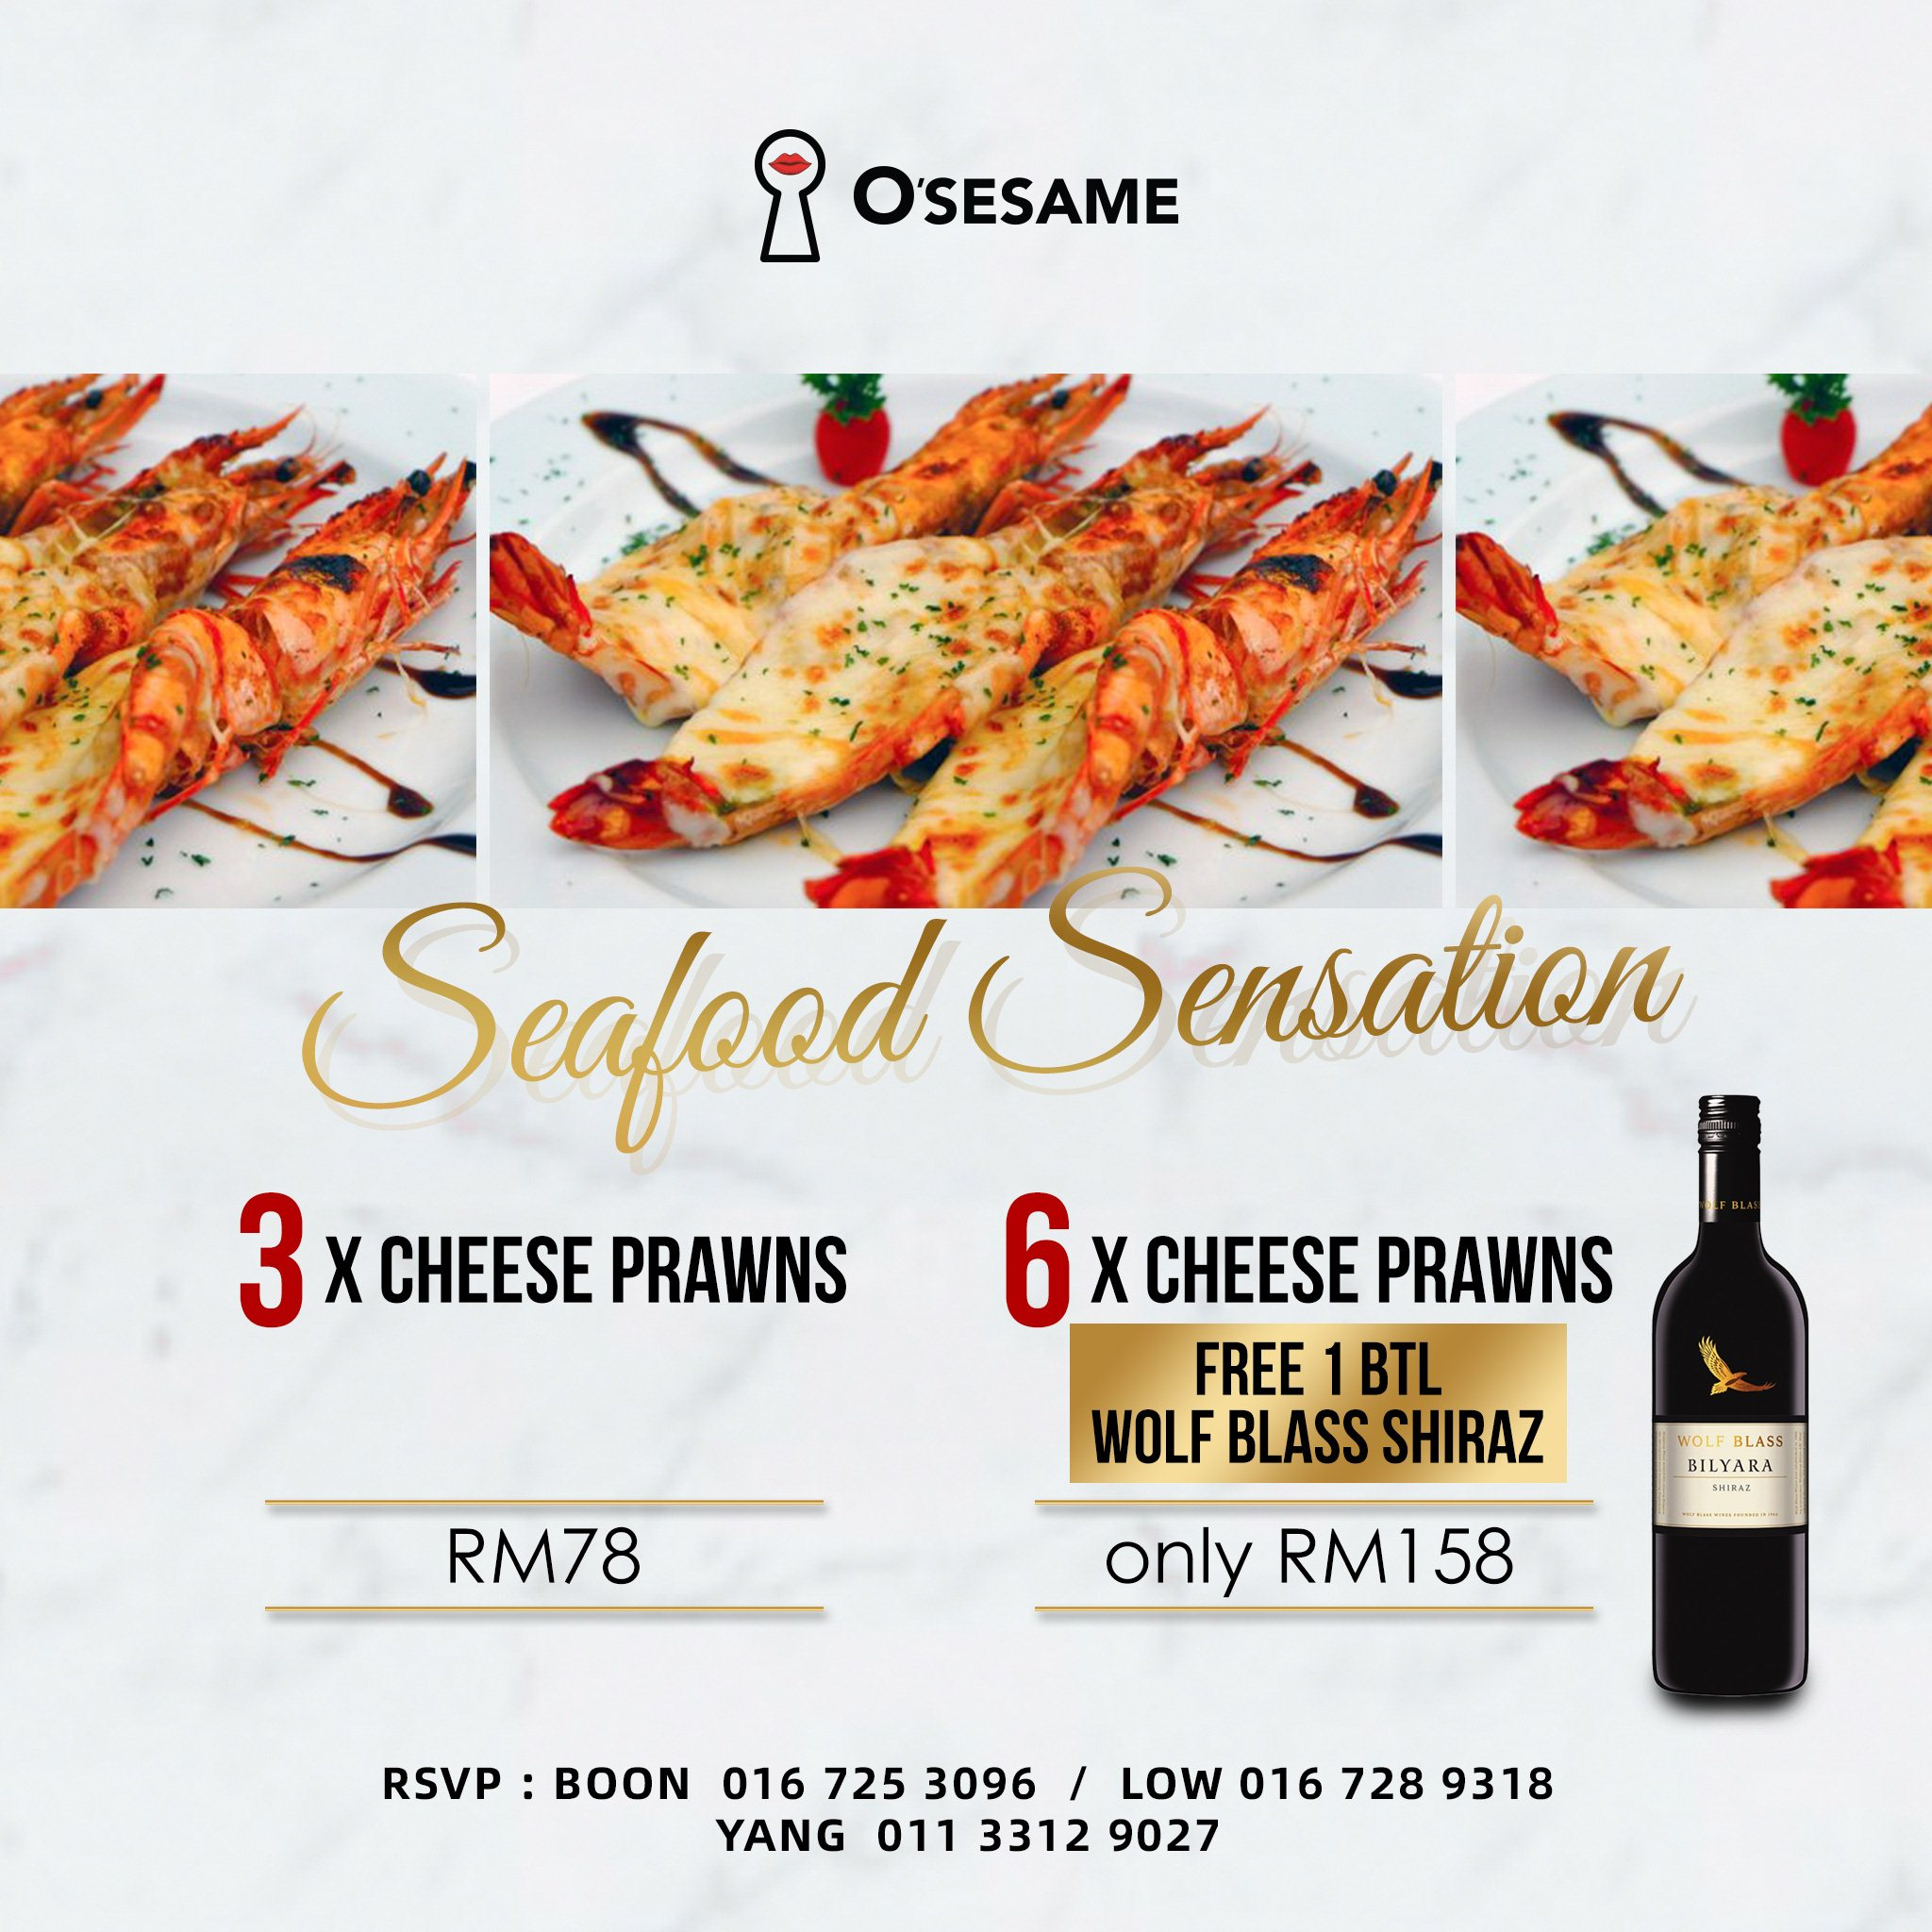 OSS Cheesy Prawn Free Red Wine Promo